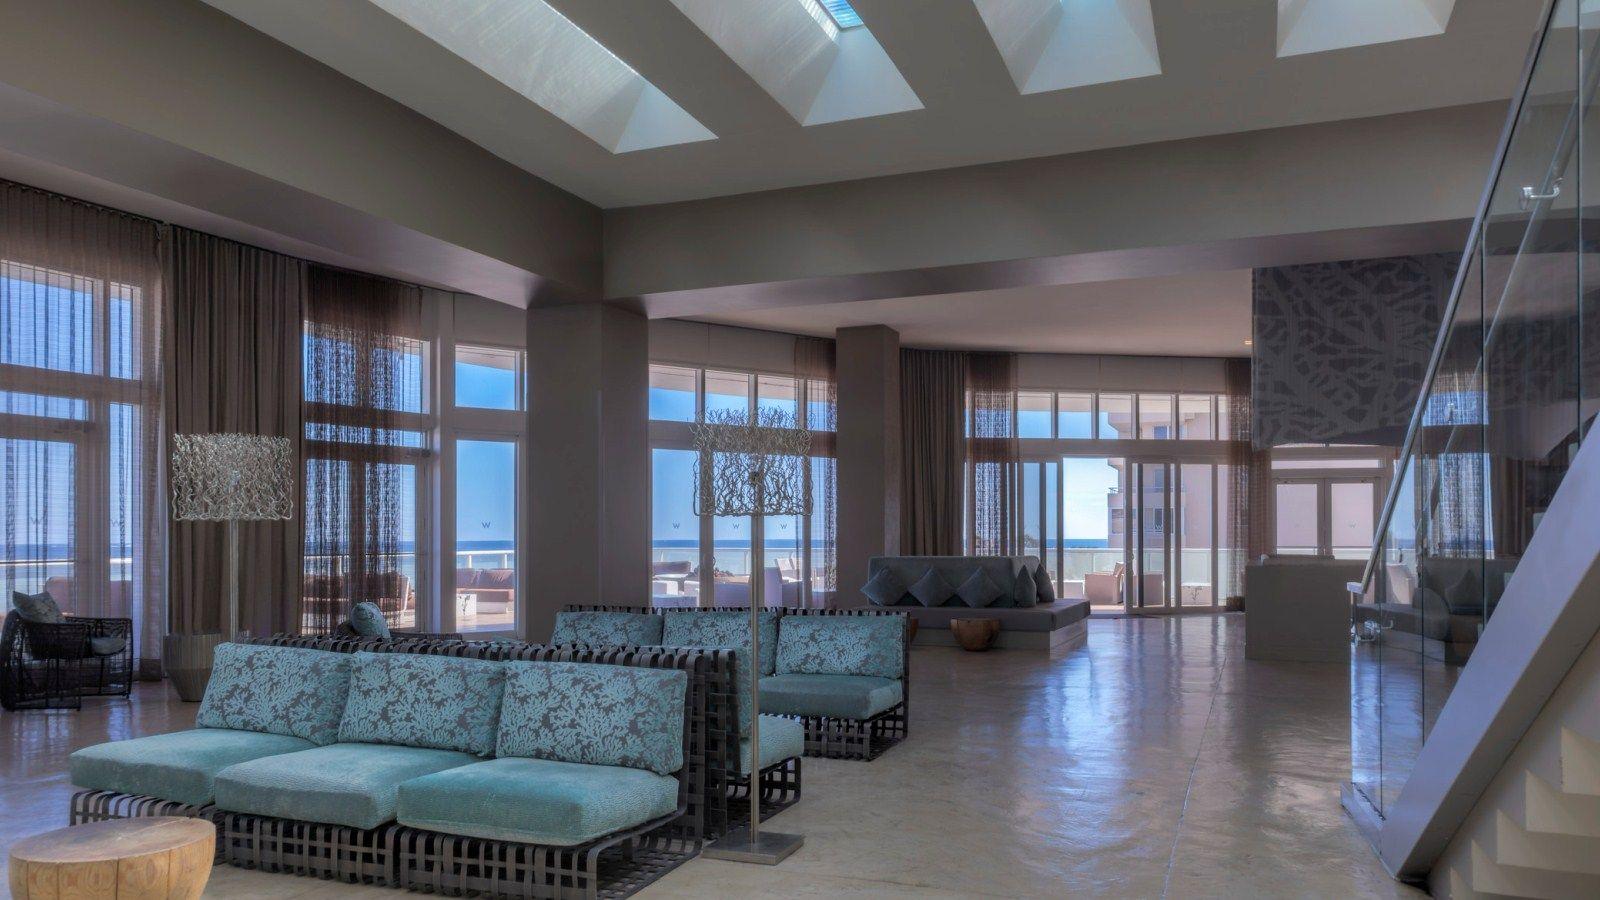 W Fort Lauderdale Photos W Fort Lauderdale Hotel Hotels Design Living Room Designs W Fort Lauderdale